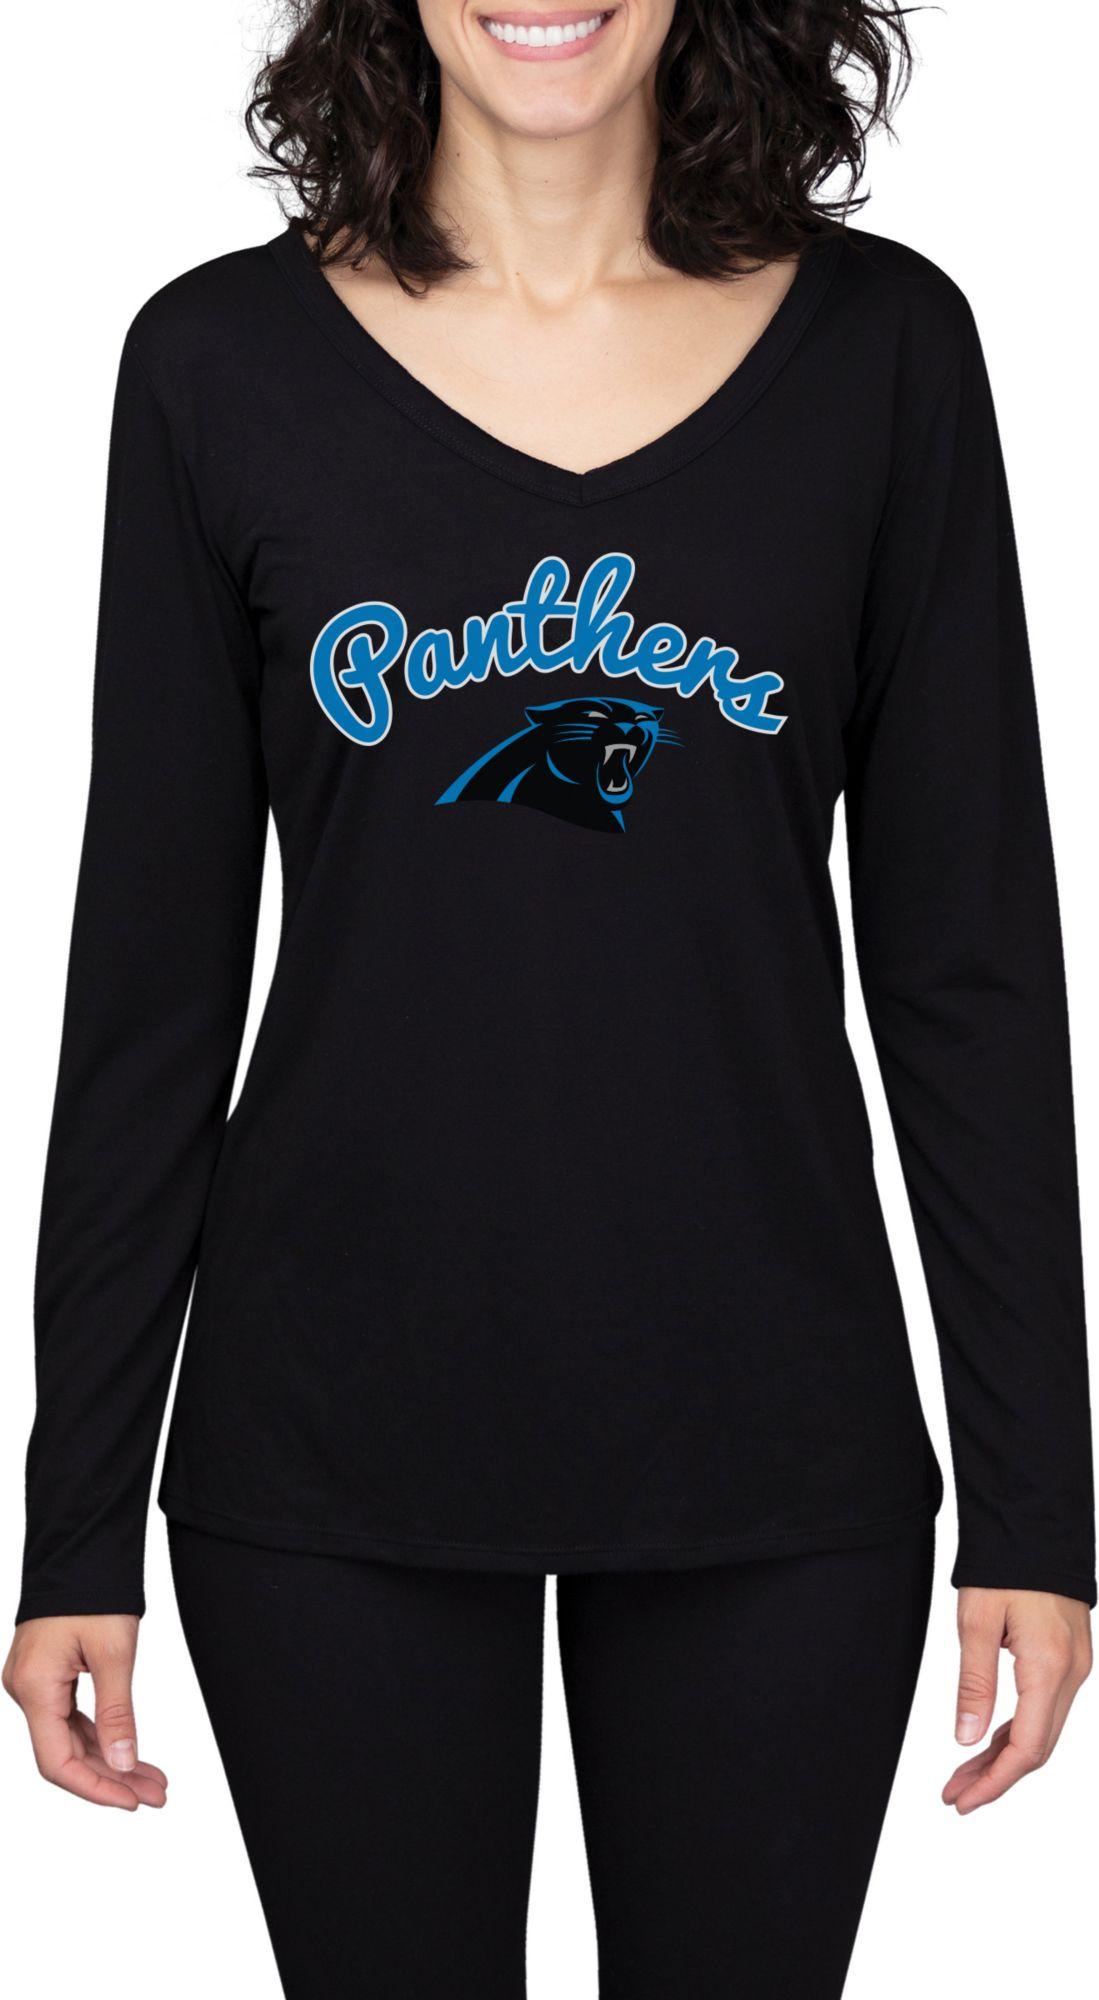 women's carolina panthers long sleeve shirt